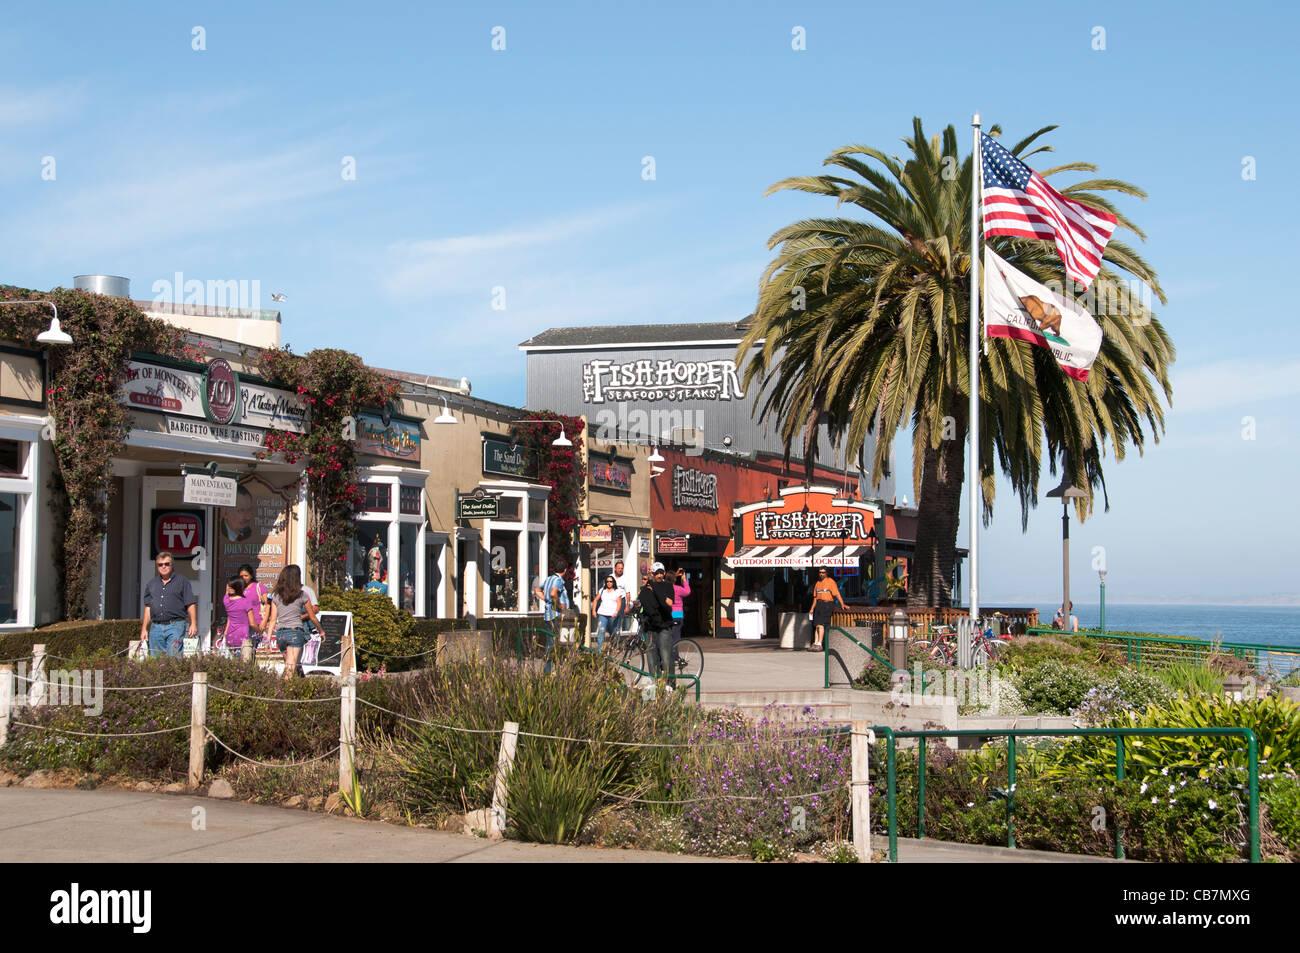 Monterey Canning Company California United States - Stock Image